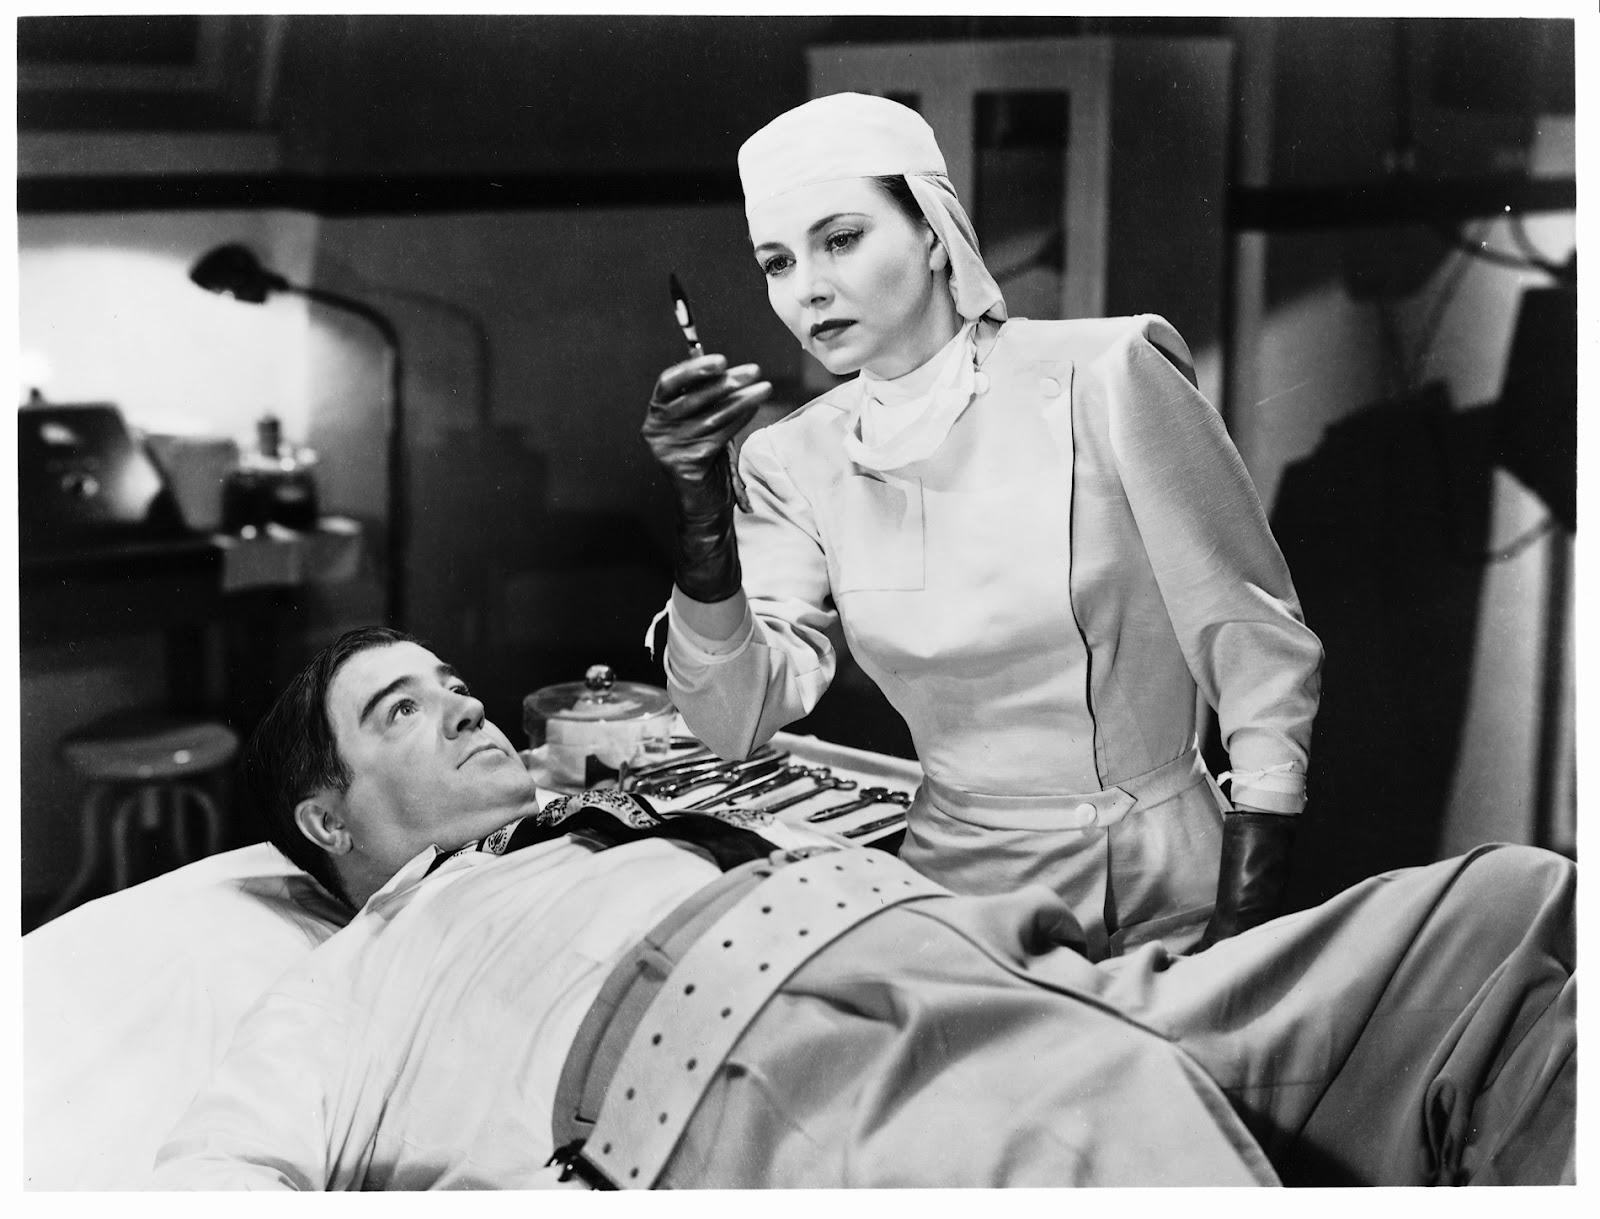 Lenore Aubert A & B Meet Frankenstein